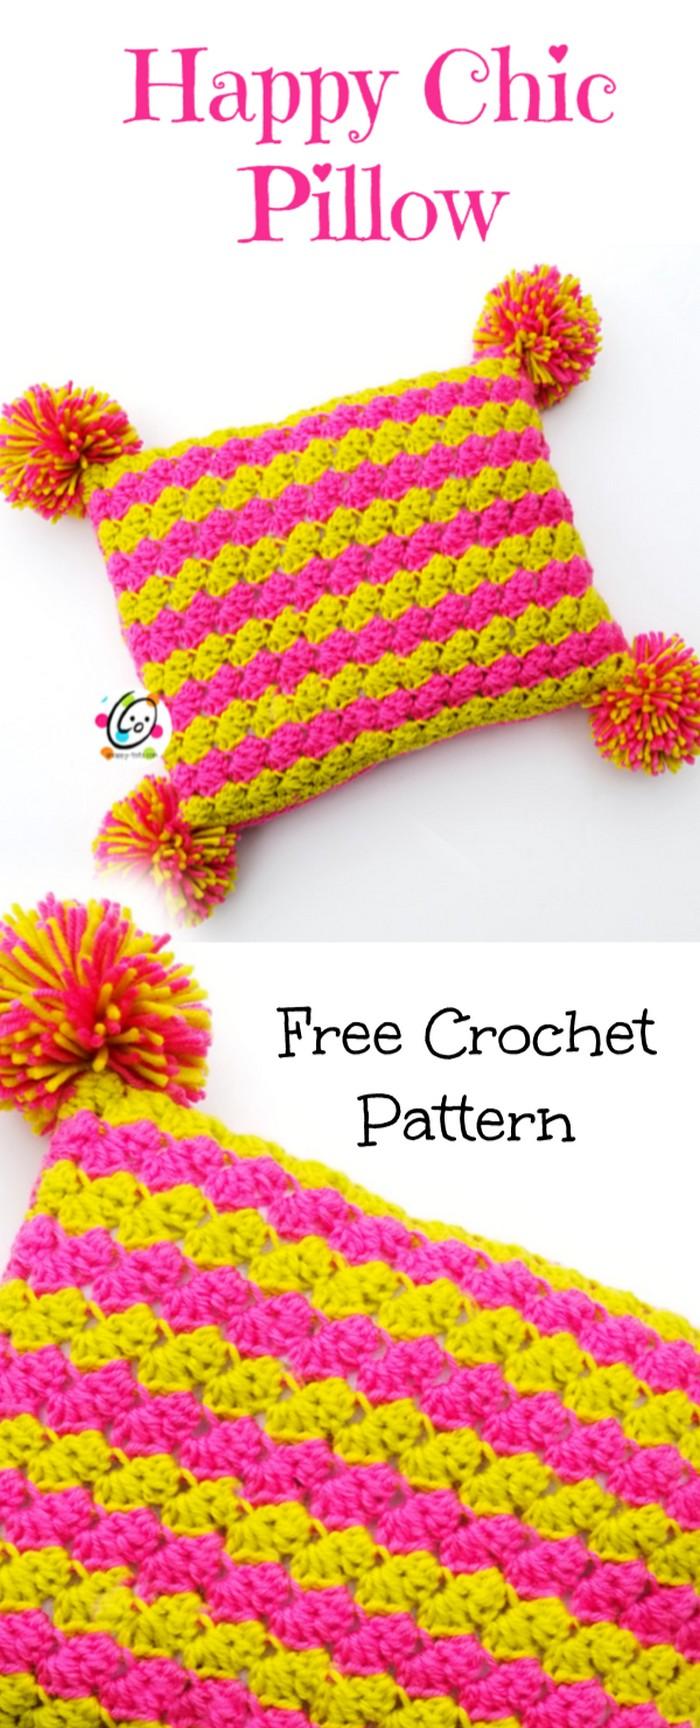 Happy Chic pillow Free Crochet Pattern